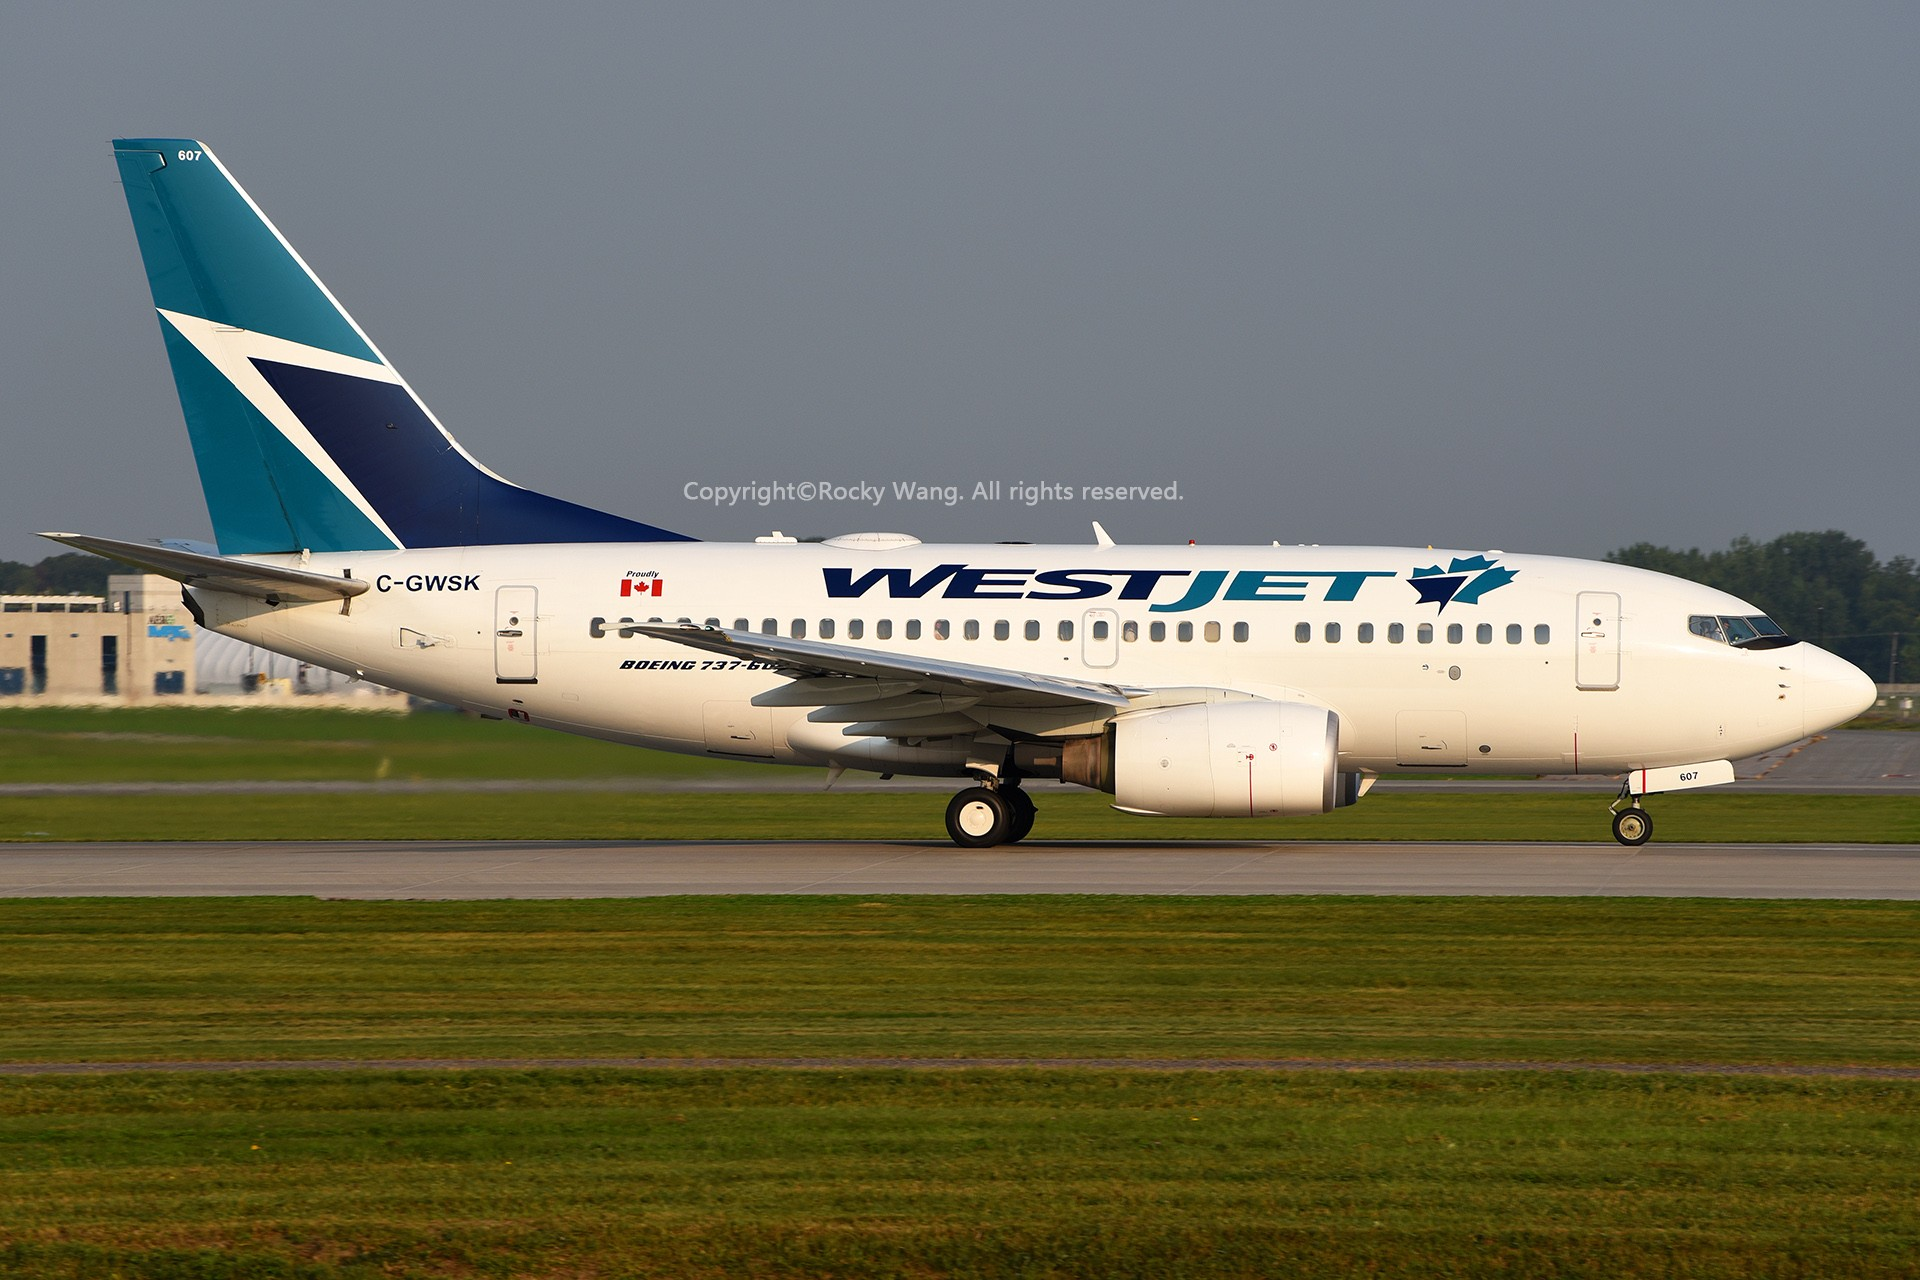 Re:[原创]窄体连连看 BOEING 737-6CT C-GWSK 加拿大蒙特利尔特鲁多机场